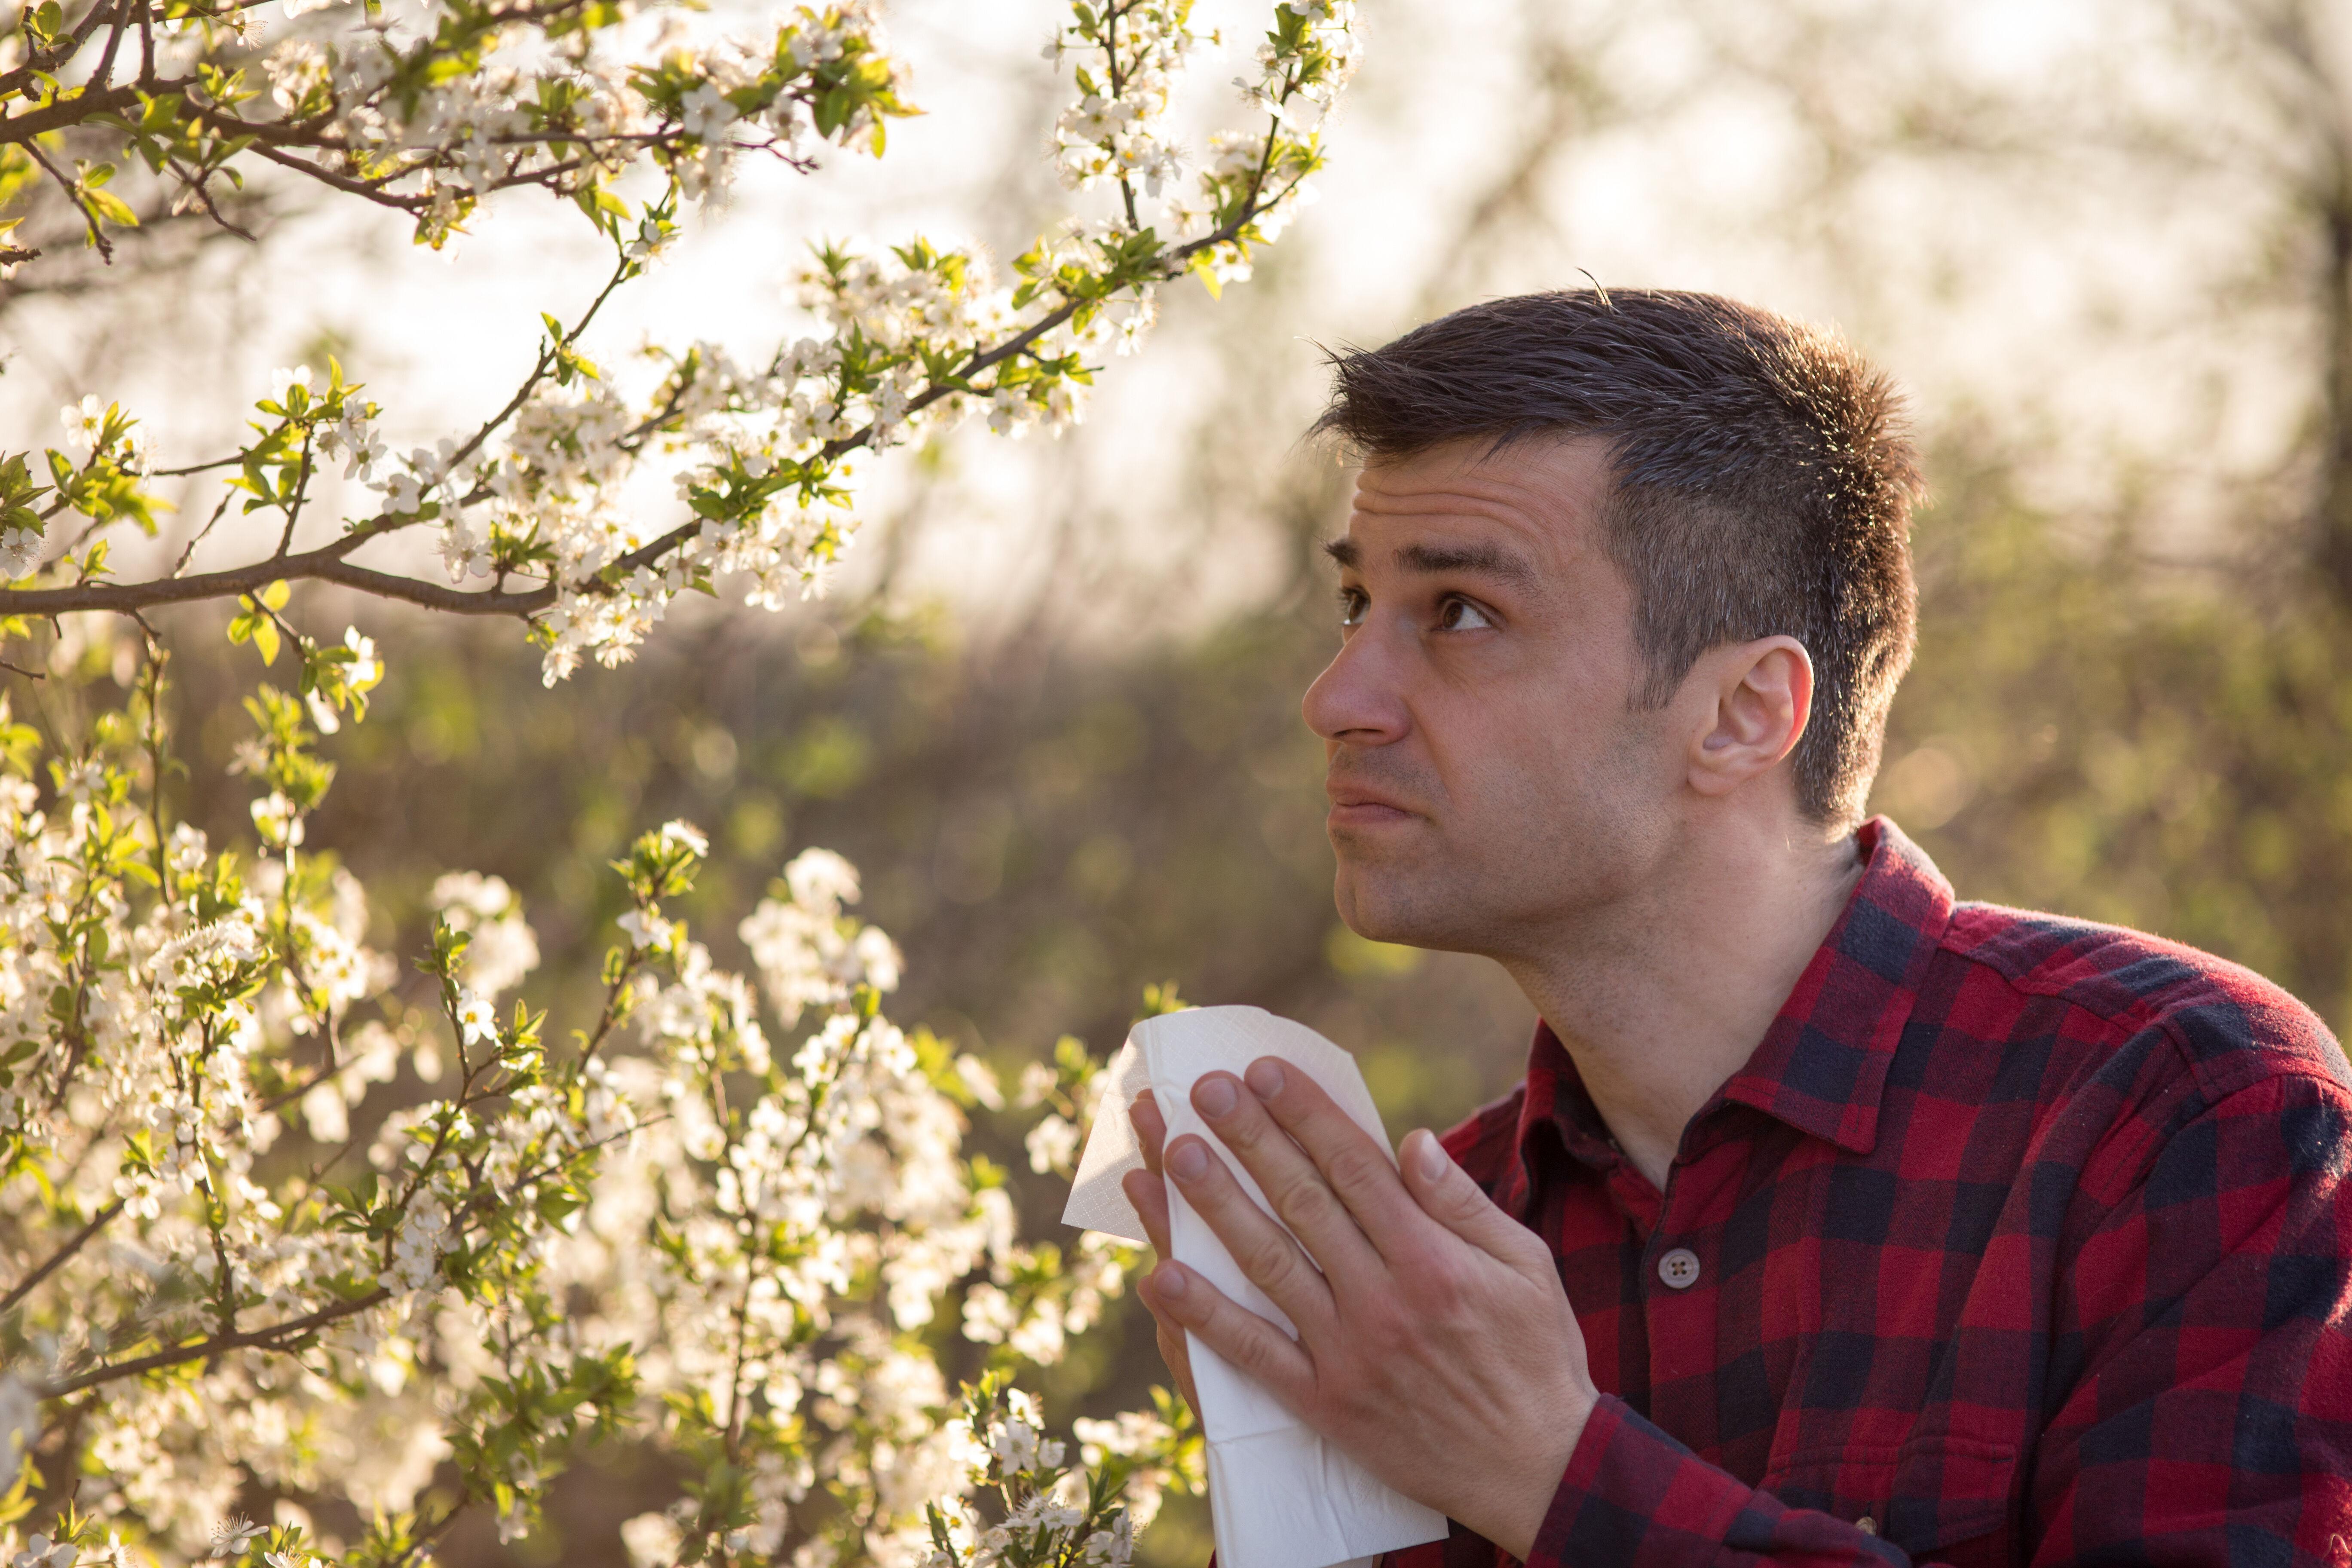 Allergic to flowering trees